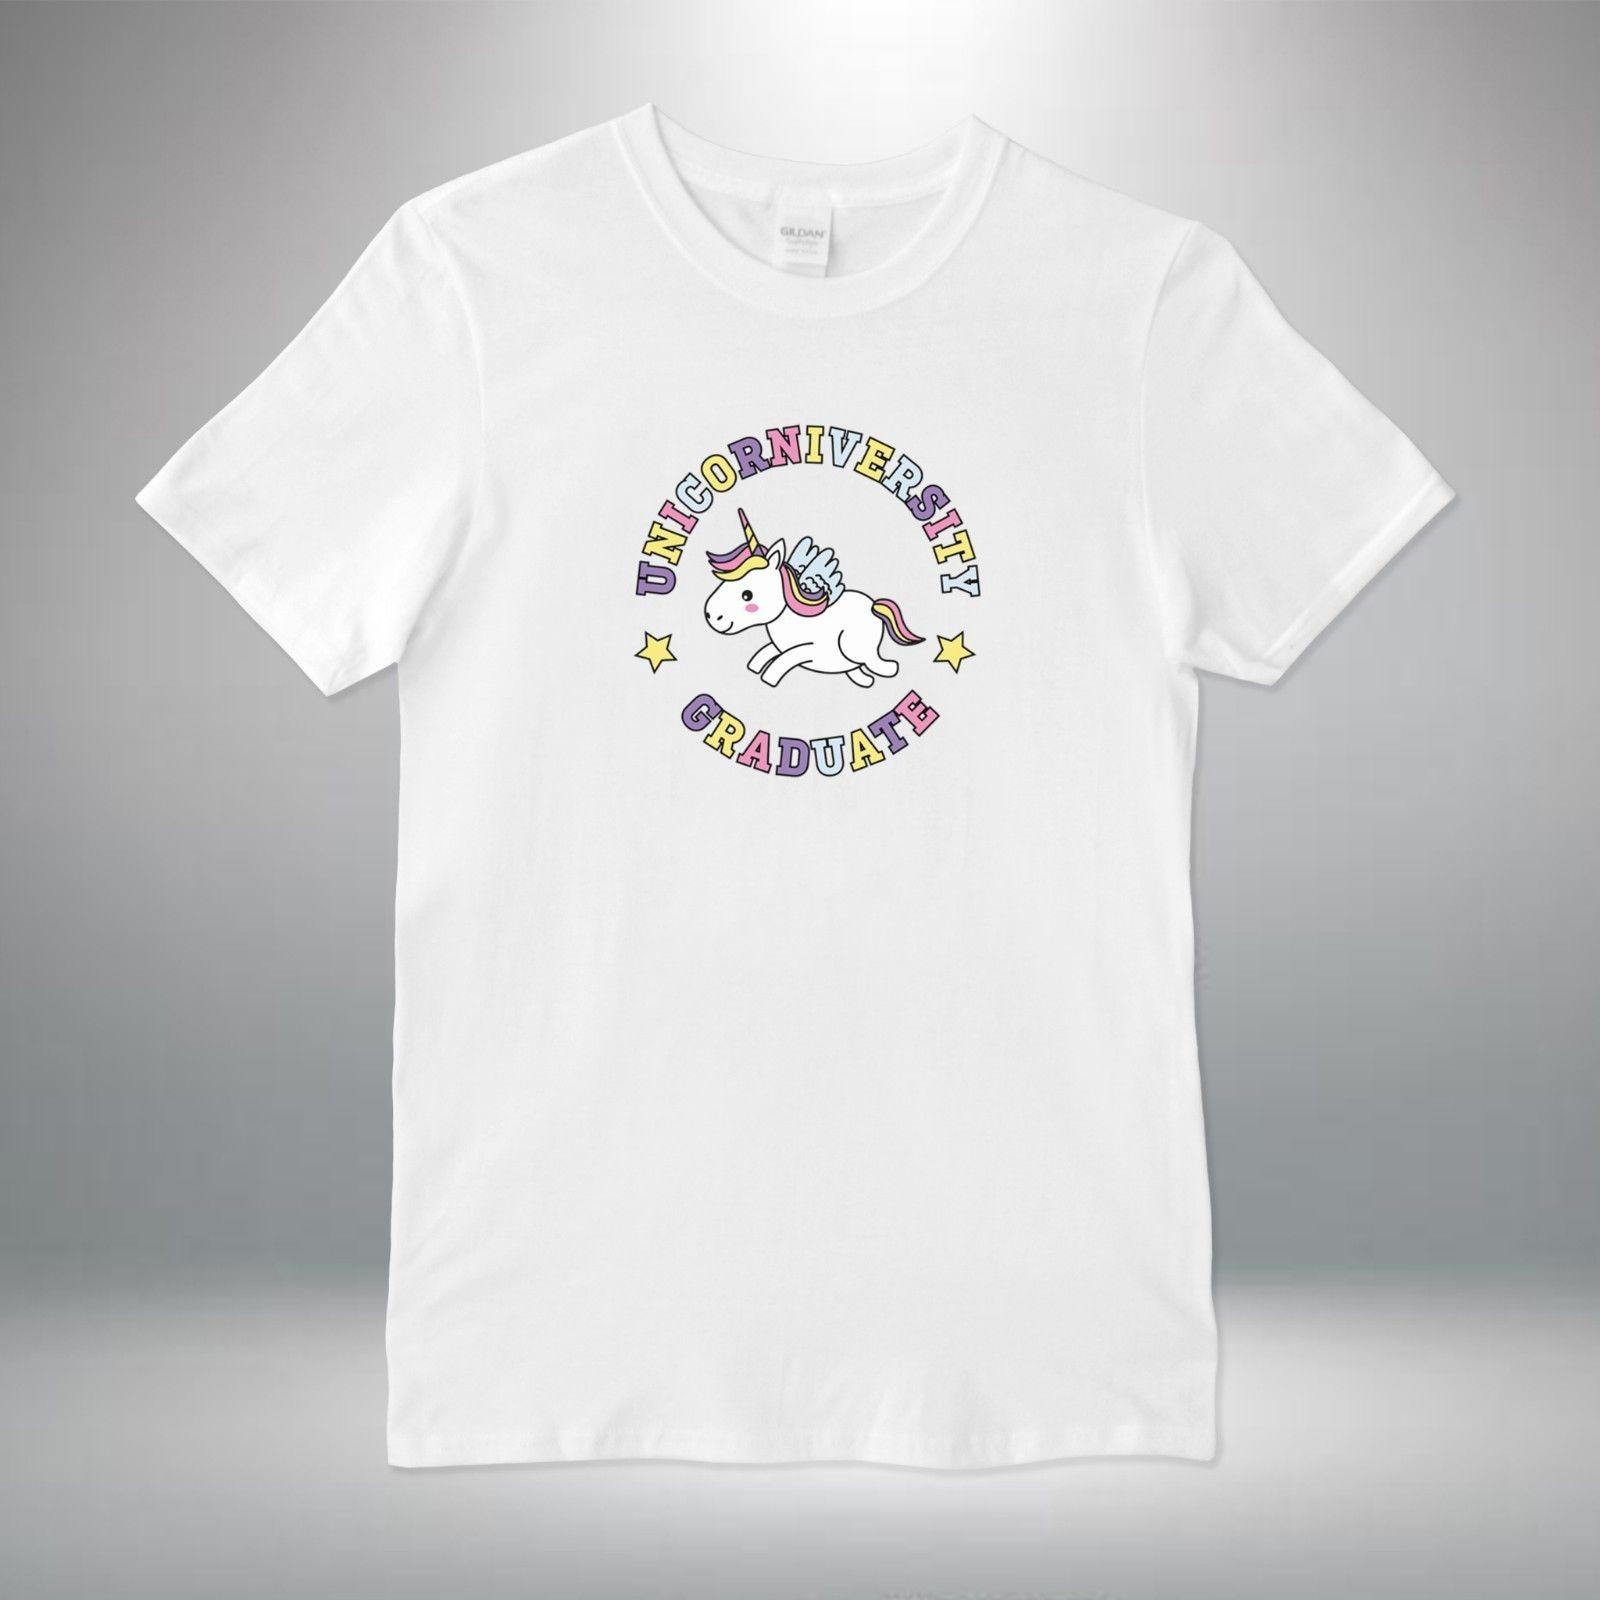 7e8716dcc40 Unicorn University Rainbow Funny Meme Tank Top Men Women Unisex Shirt With  T Shirt Buy Funny T Shirts Online From Belief85